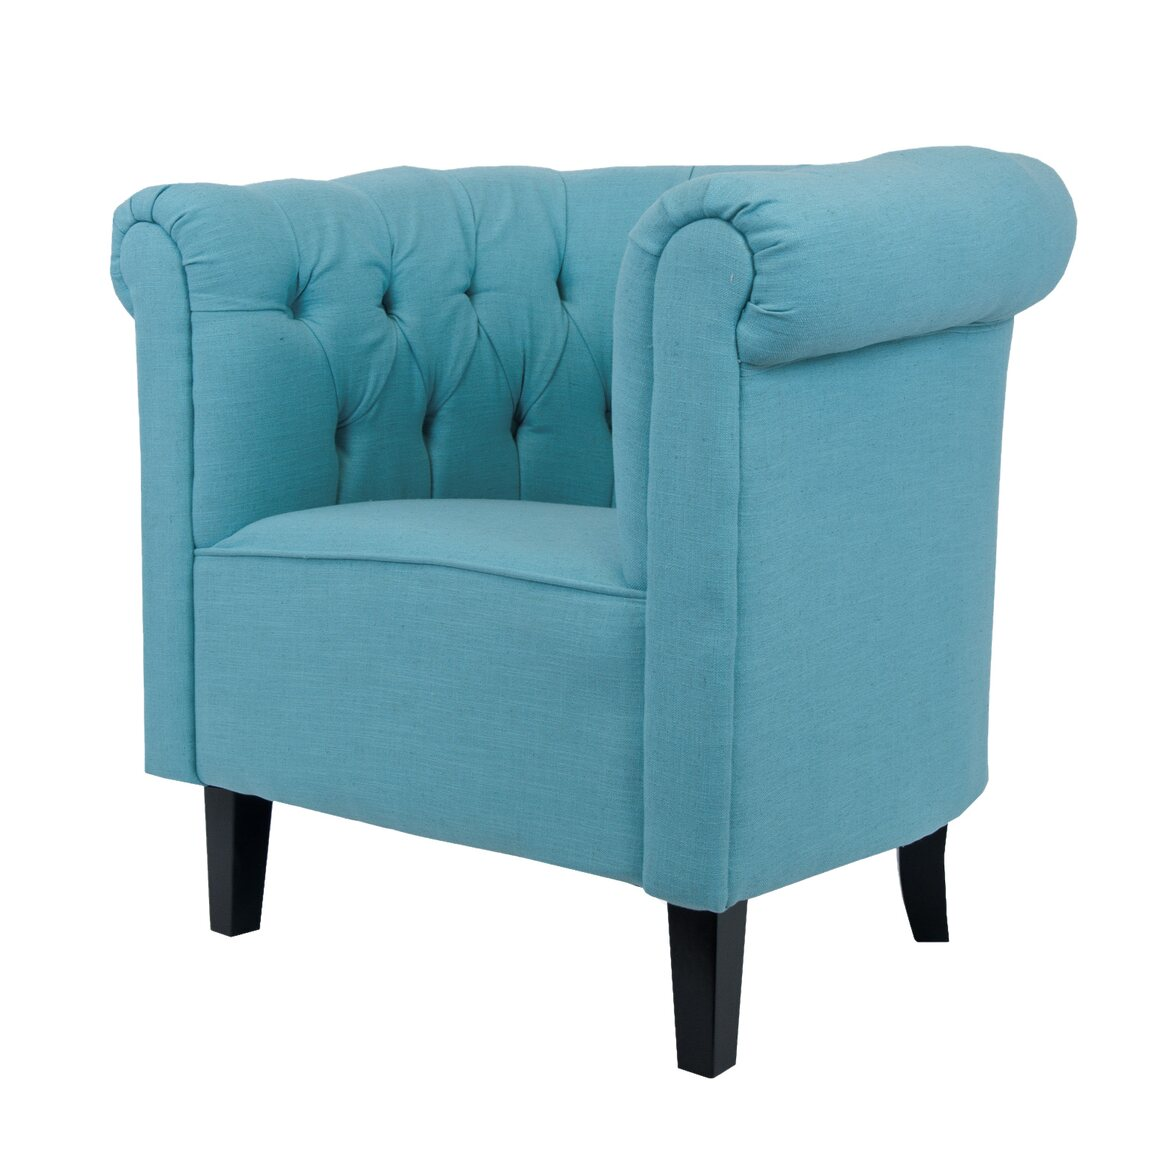 Кресло Swaun turquoise 4 | Каминные кресла Kingsby